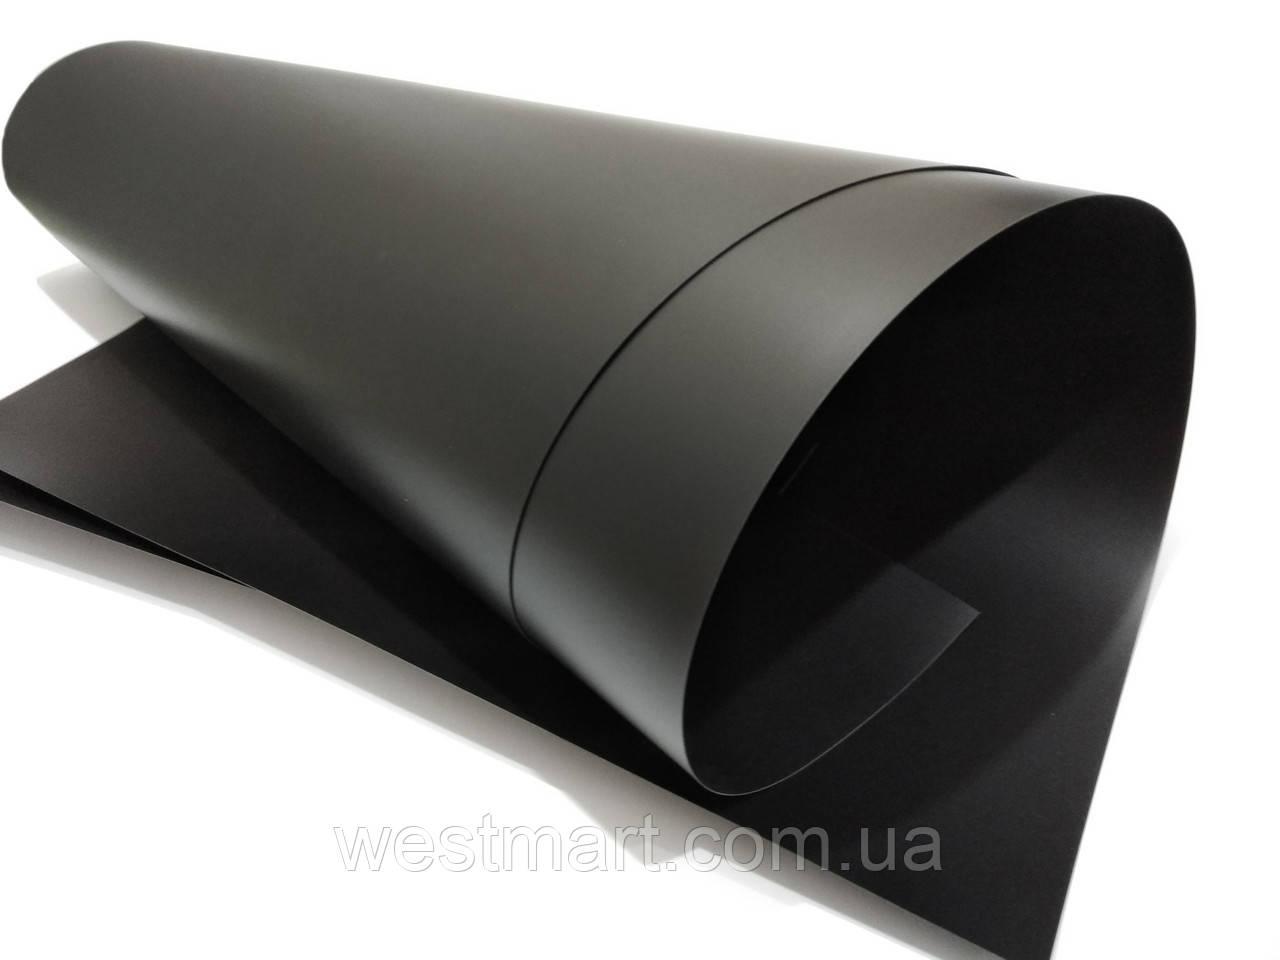 Полипропилен Priplak черный 0,3 мм кварц/мат. 800х1200мм